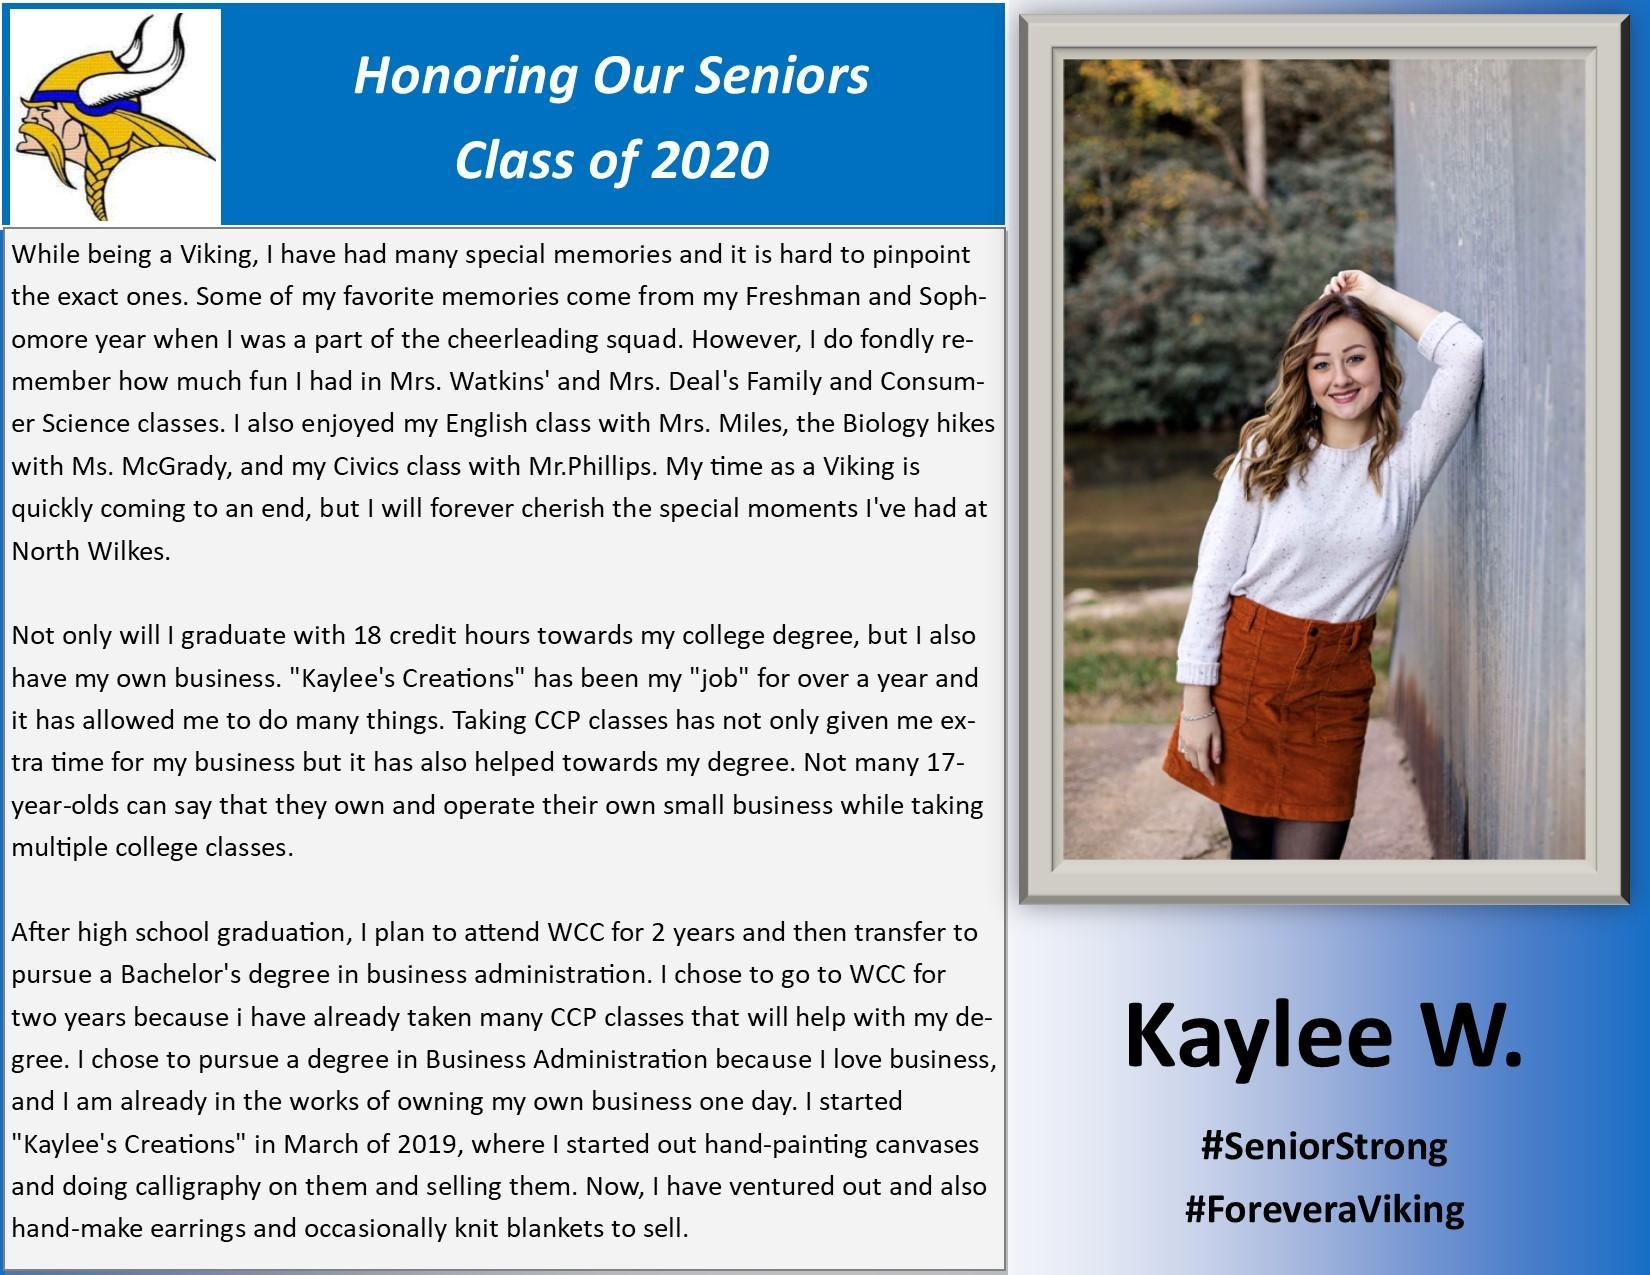 Kaylee W.